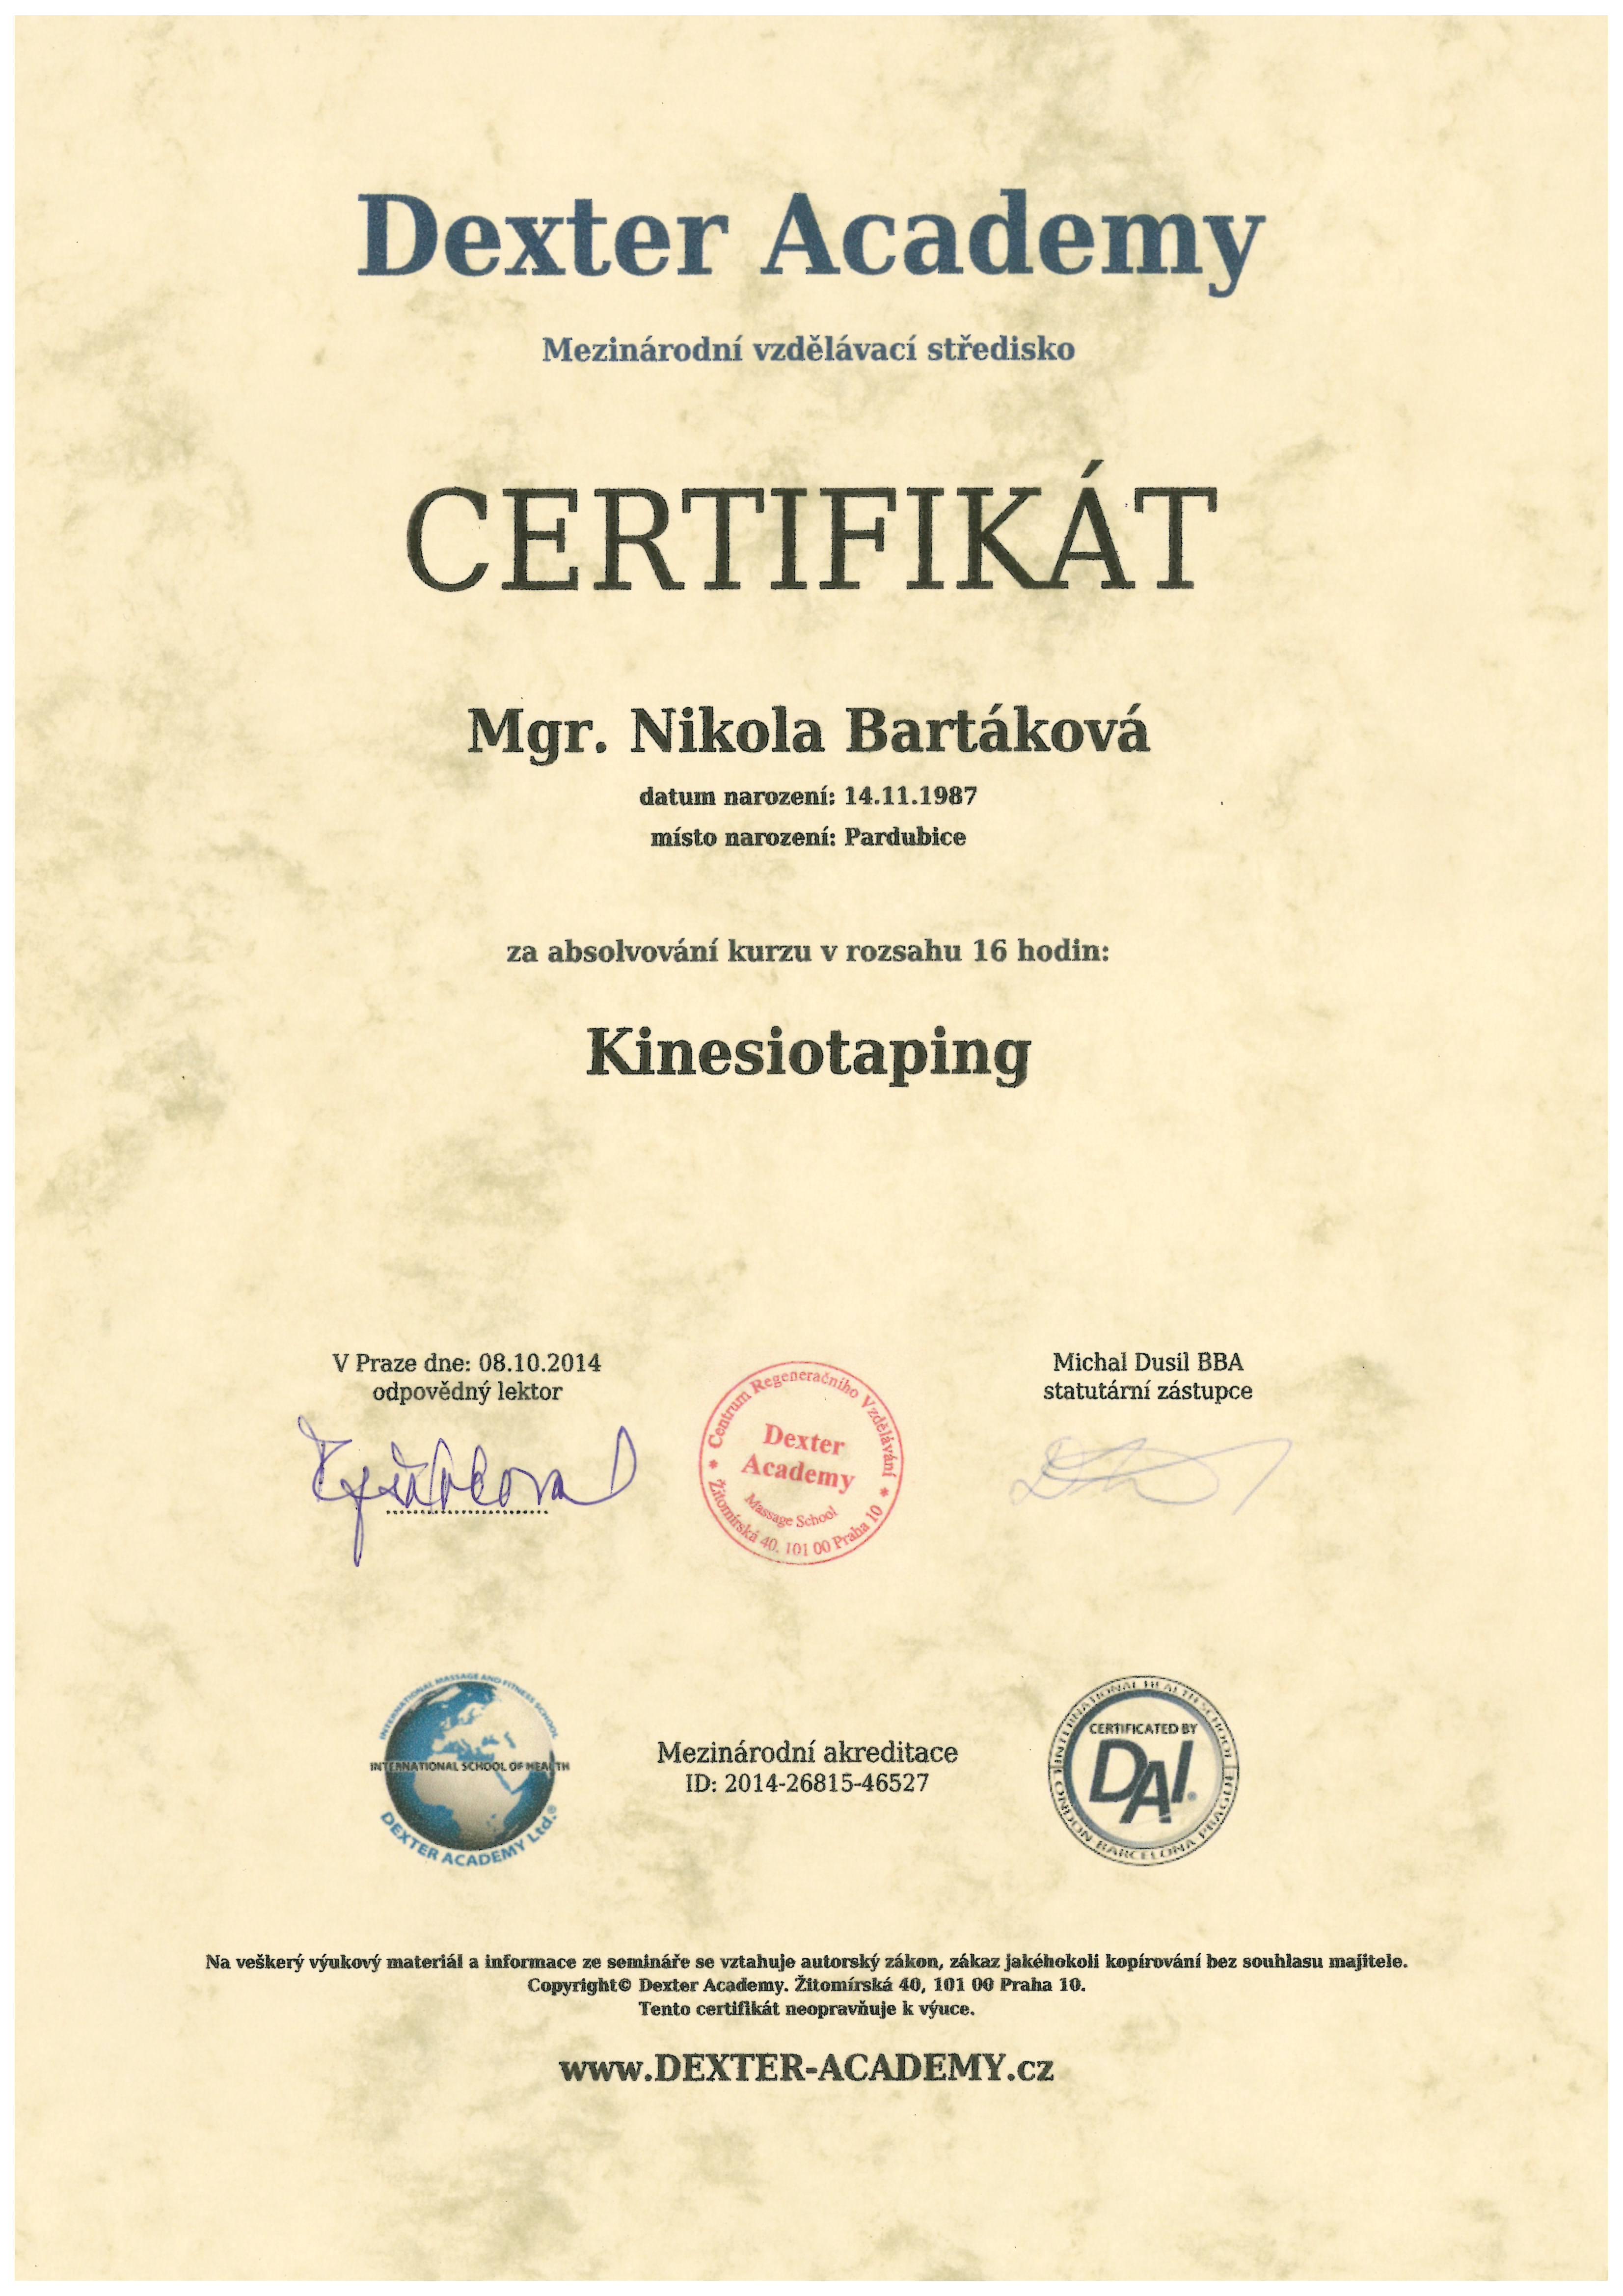 certifikat dexter kindesiotape 2014